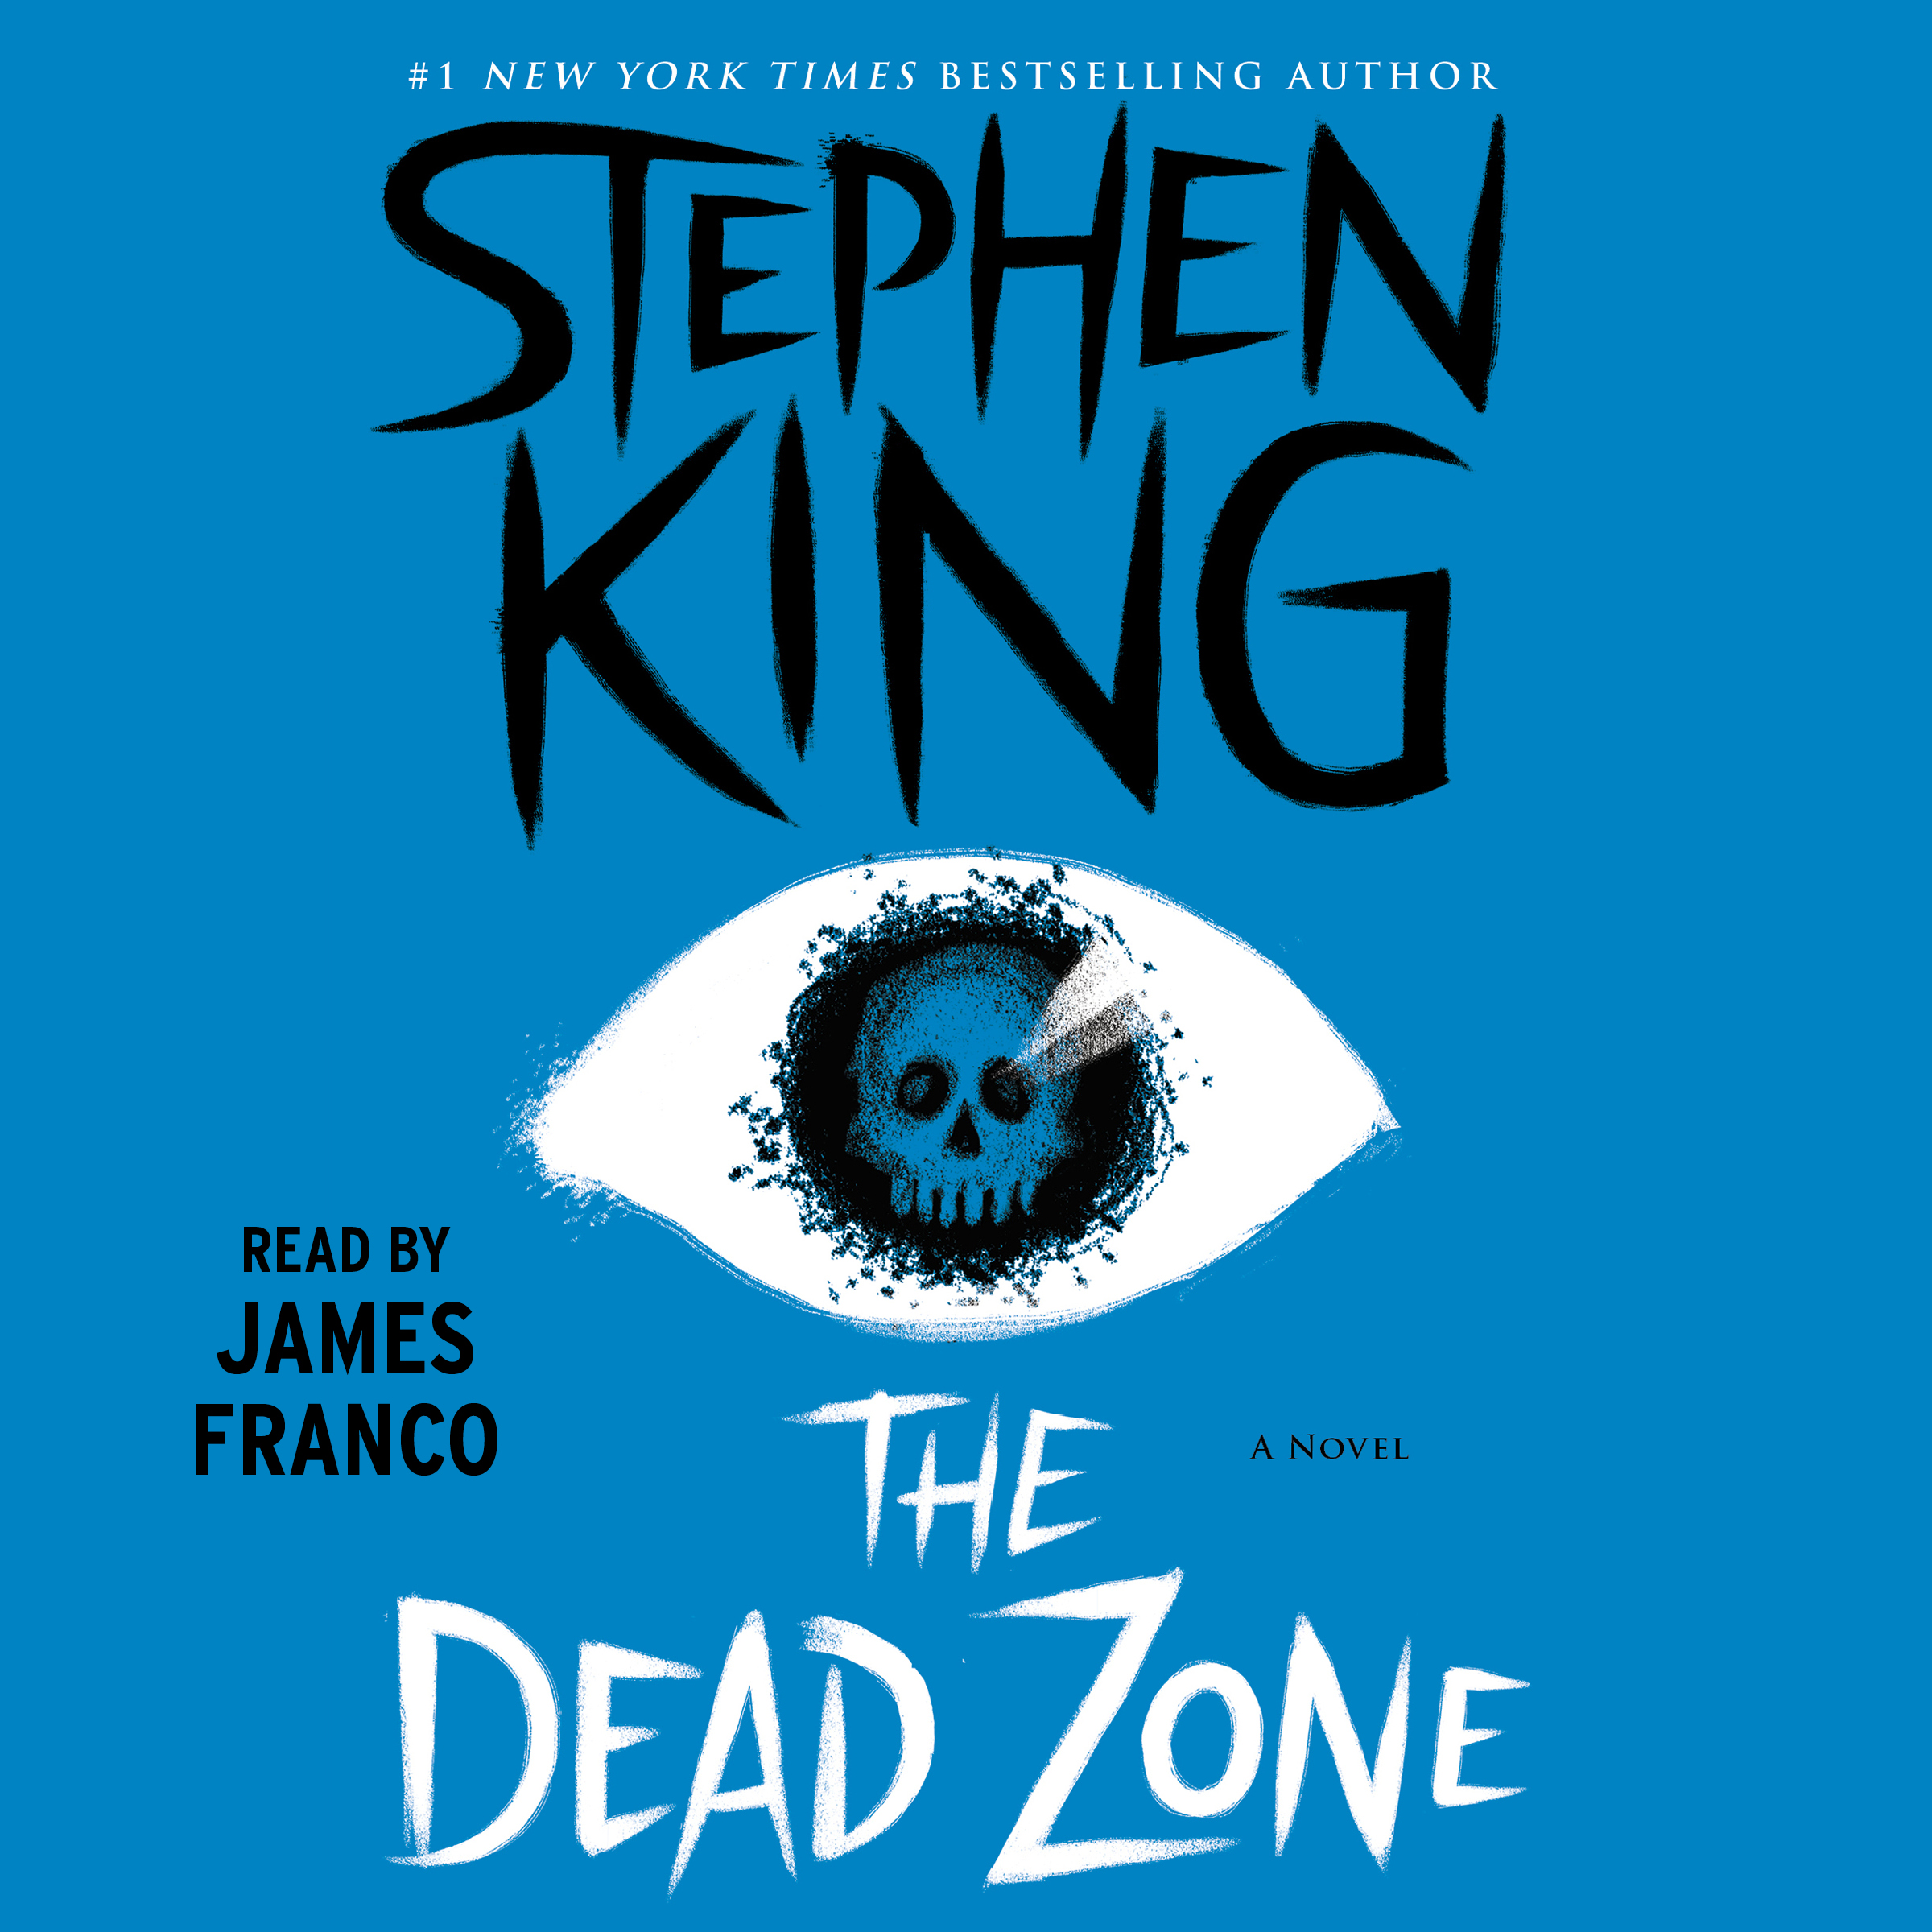 The dead zone 9781508217862 hr